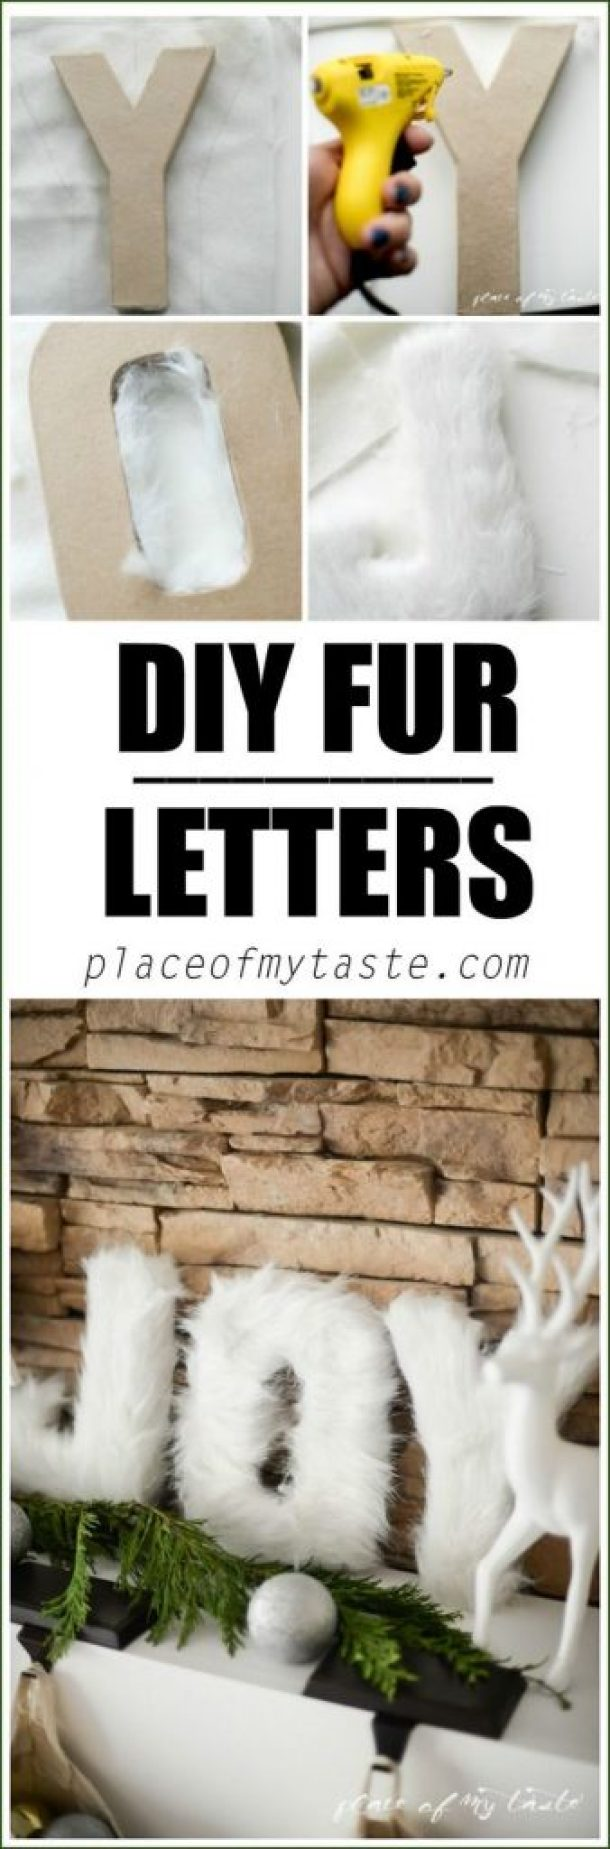 DIY Fur Letters Christmas Mantel Decorations Tutorial   Place of My Taste